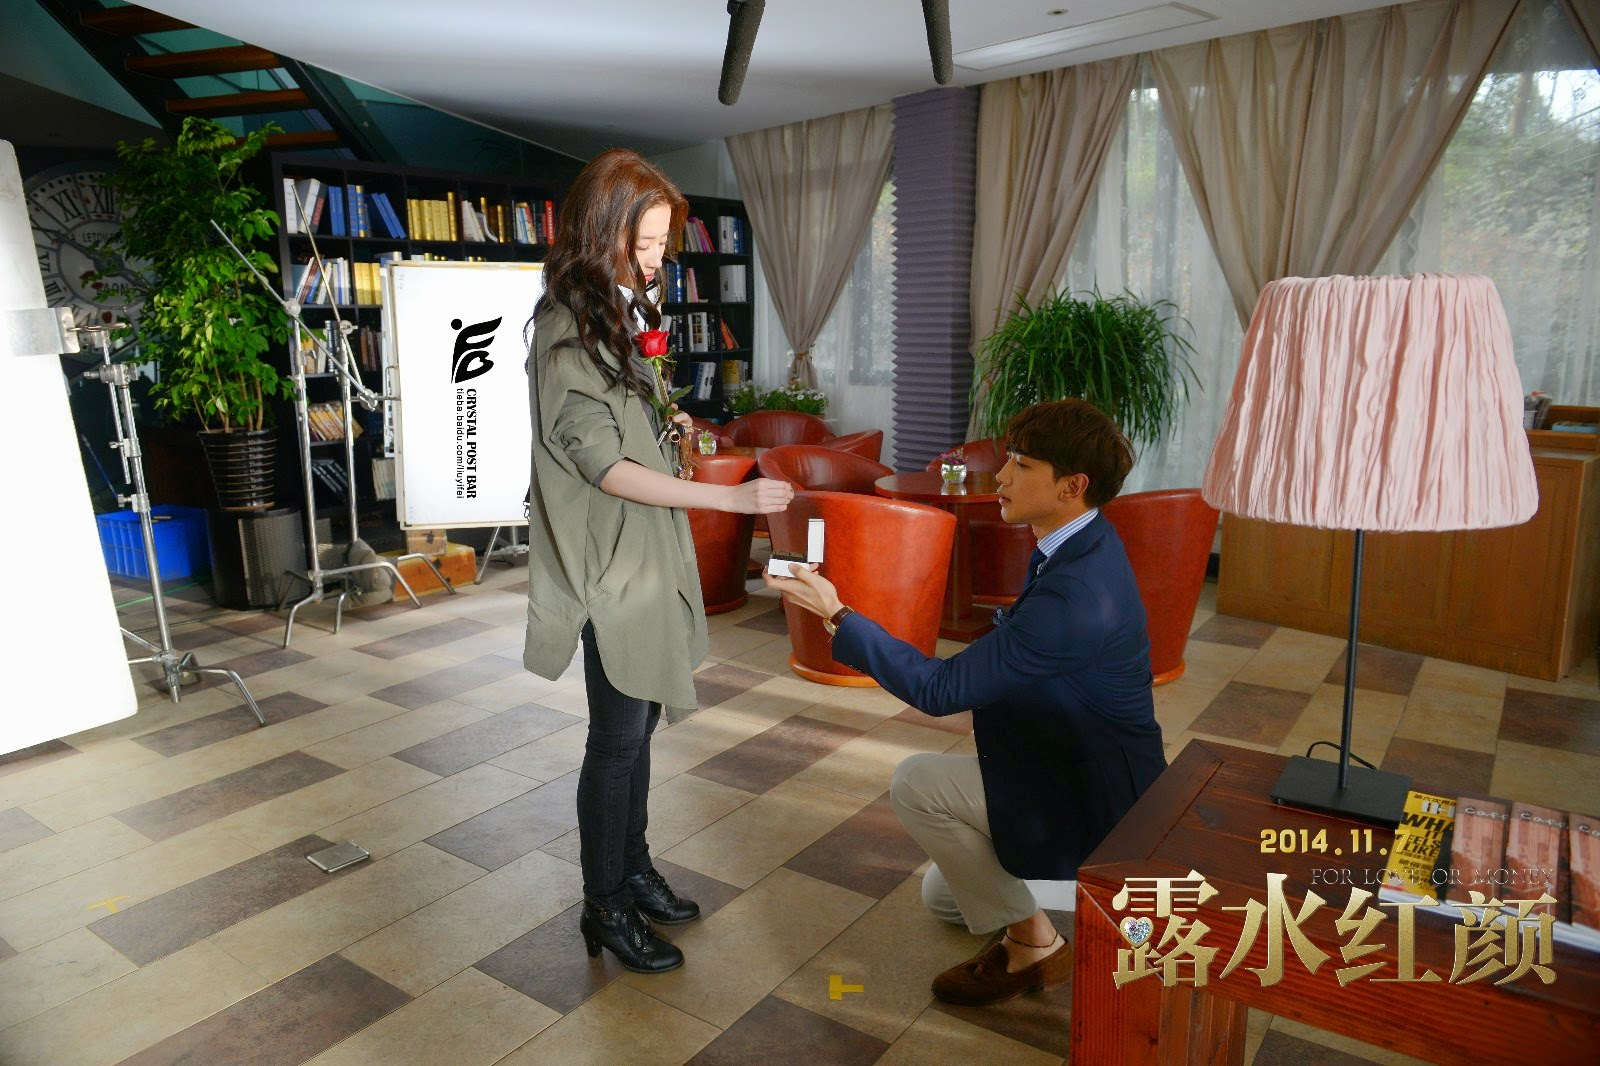 Rain 中国映画 露水紅顔_c0047605_813847.jpg